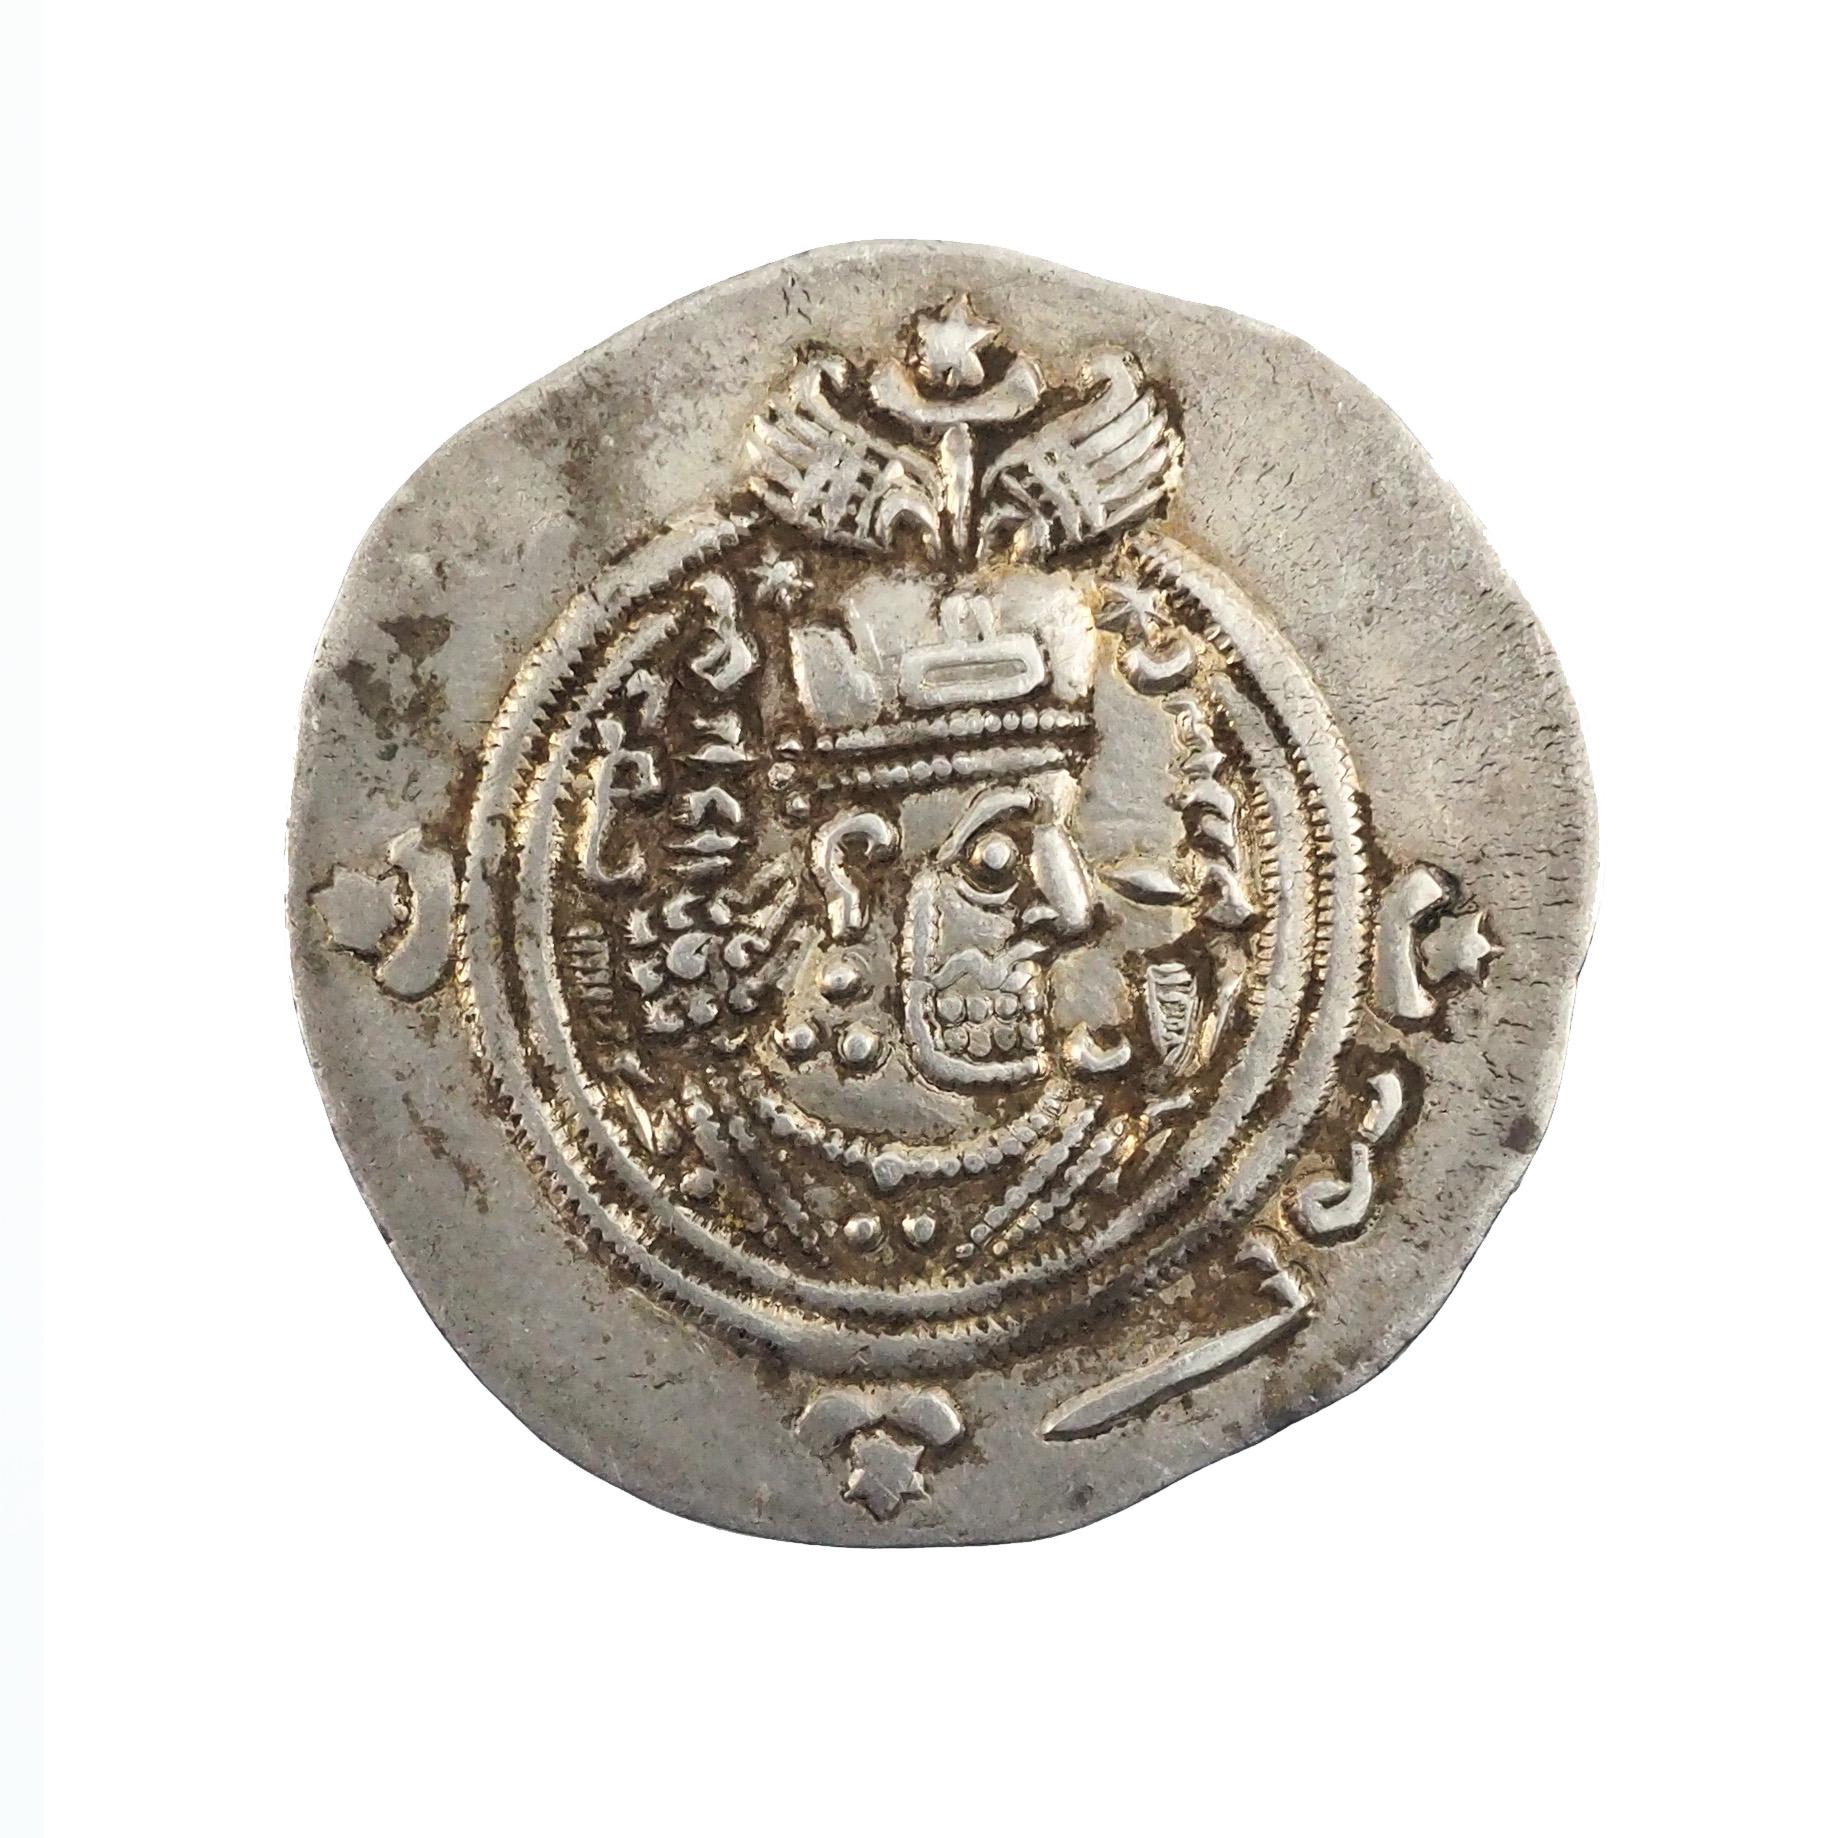 Arabo-Sassanide, Yarsgard III (632-651), Drahm, Argent, RARE QUALITE !!!